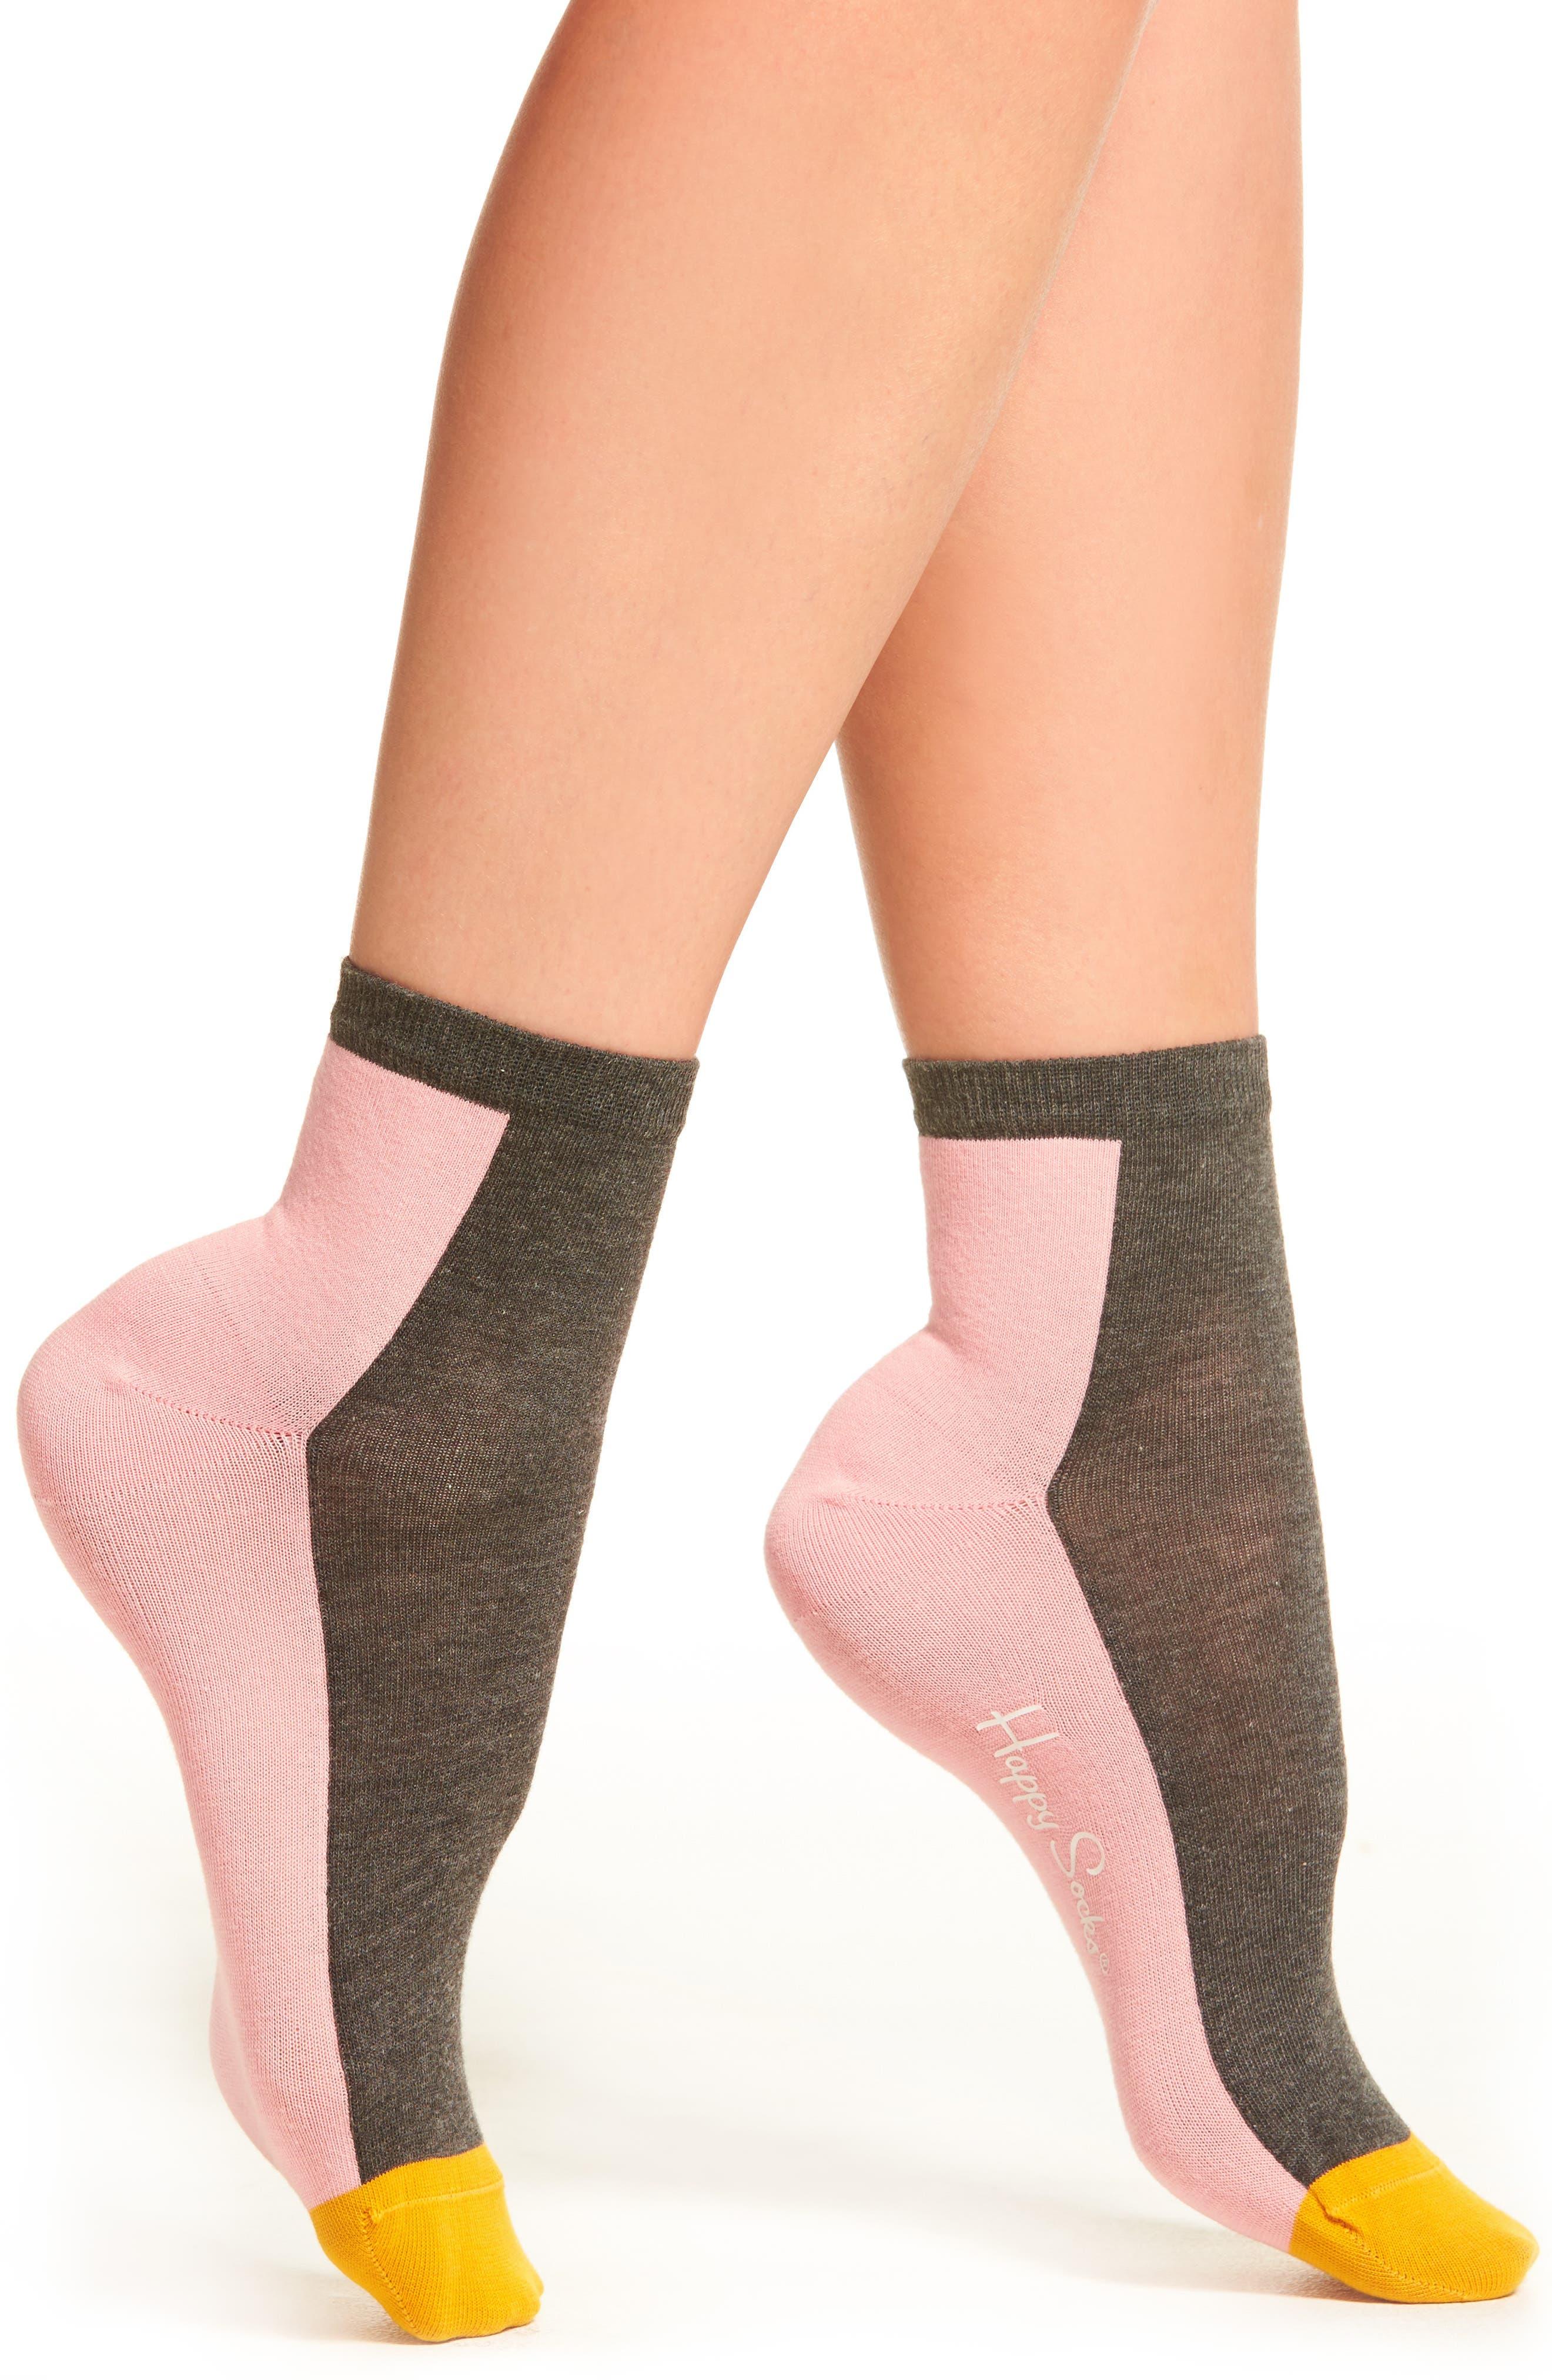 Anklet Socks,                             Main thumbnail 1, color,                             Grey